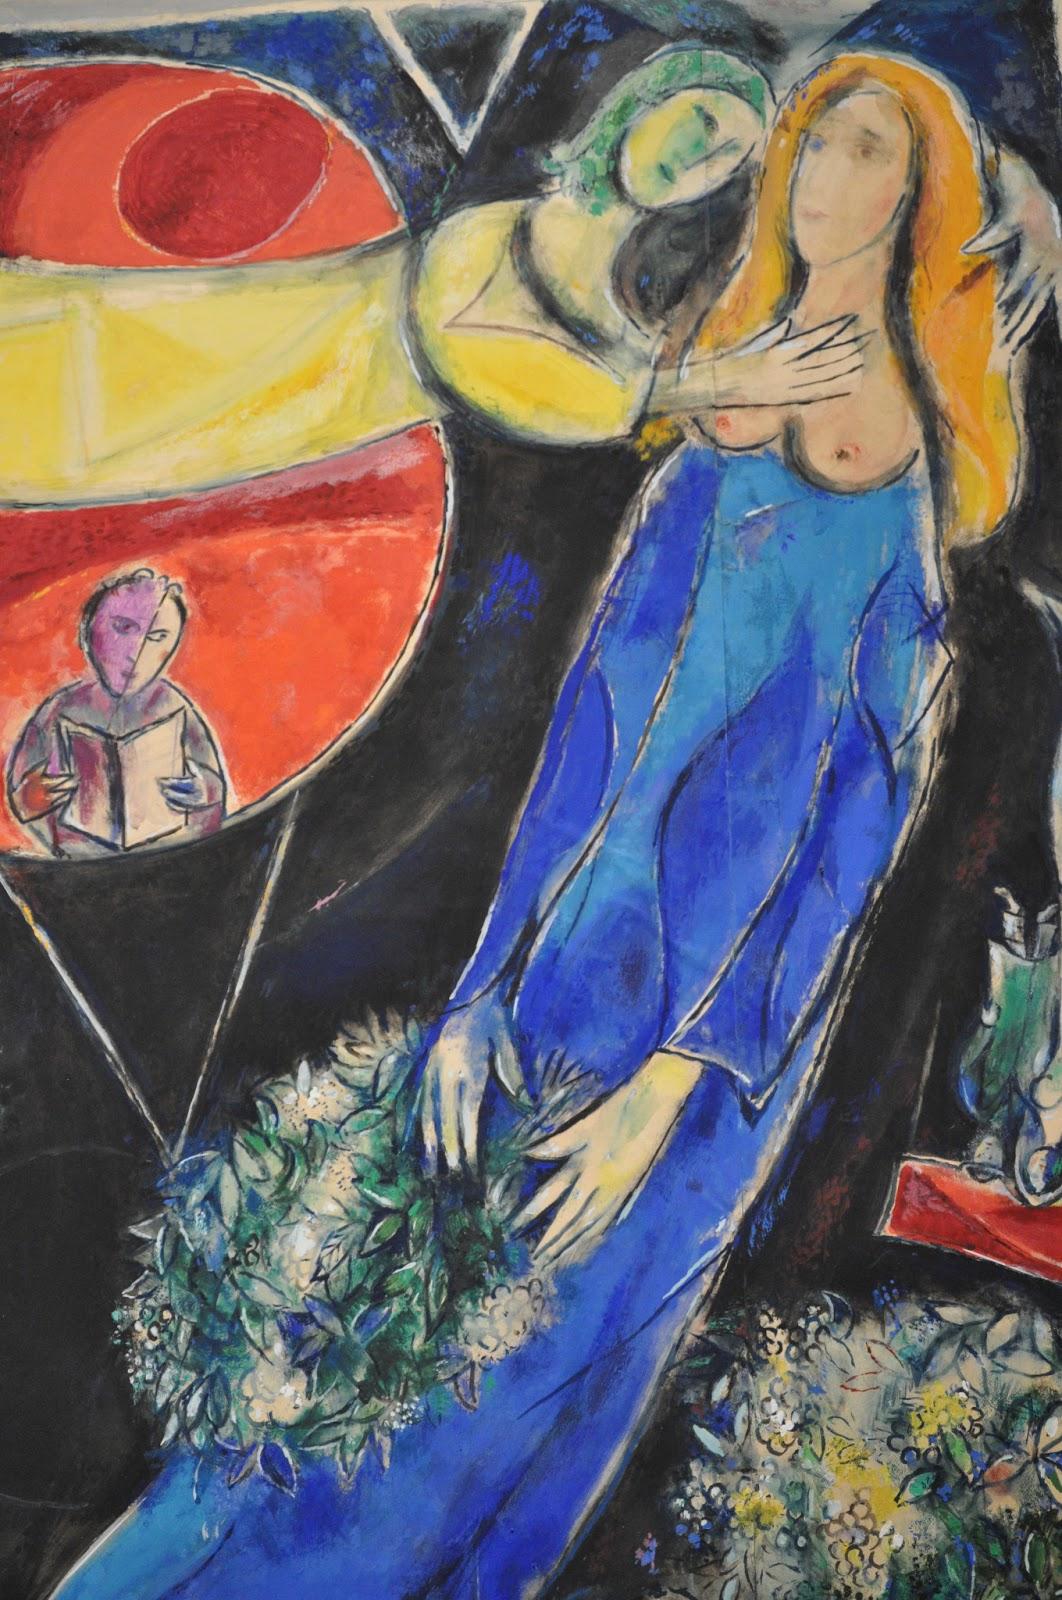 Iolanda andrade marc chagall 39 s exhibition at mus e du for Marc chagall paris vu de ma fenetre